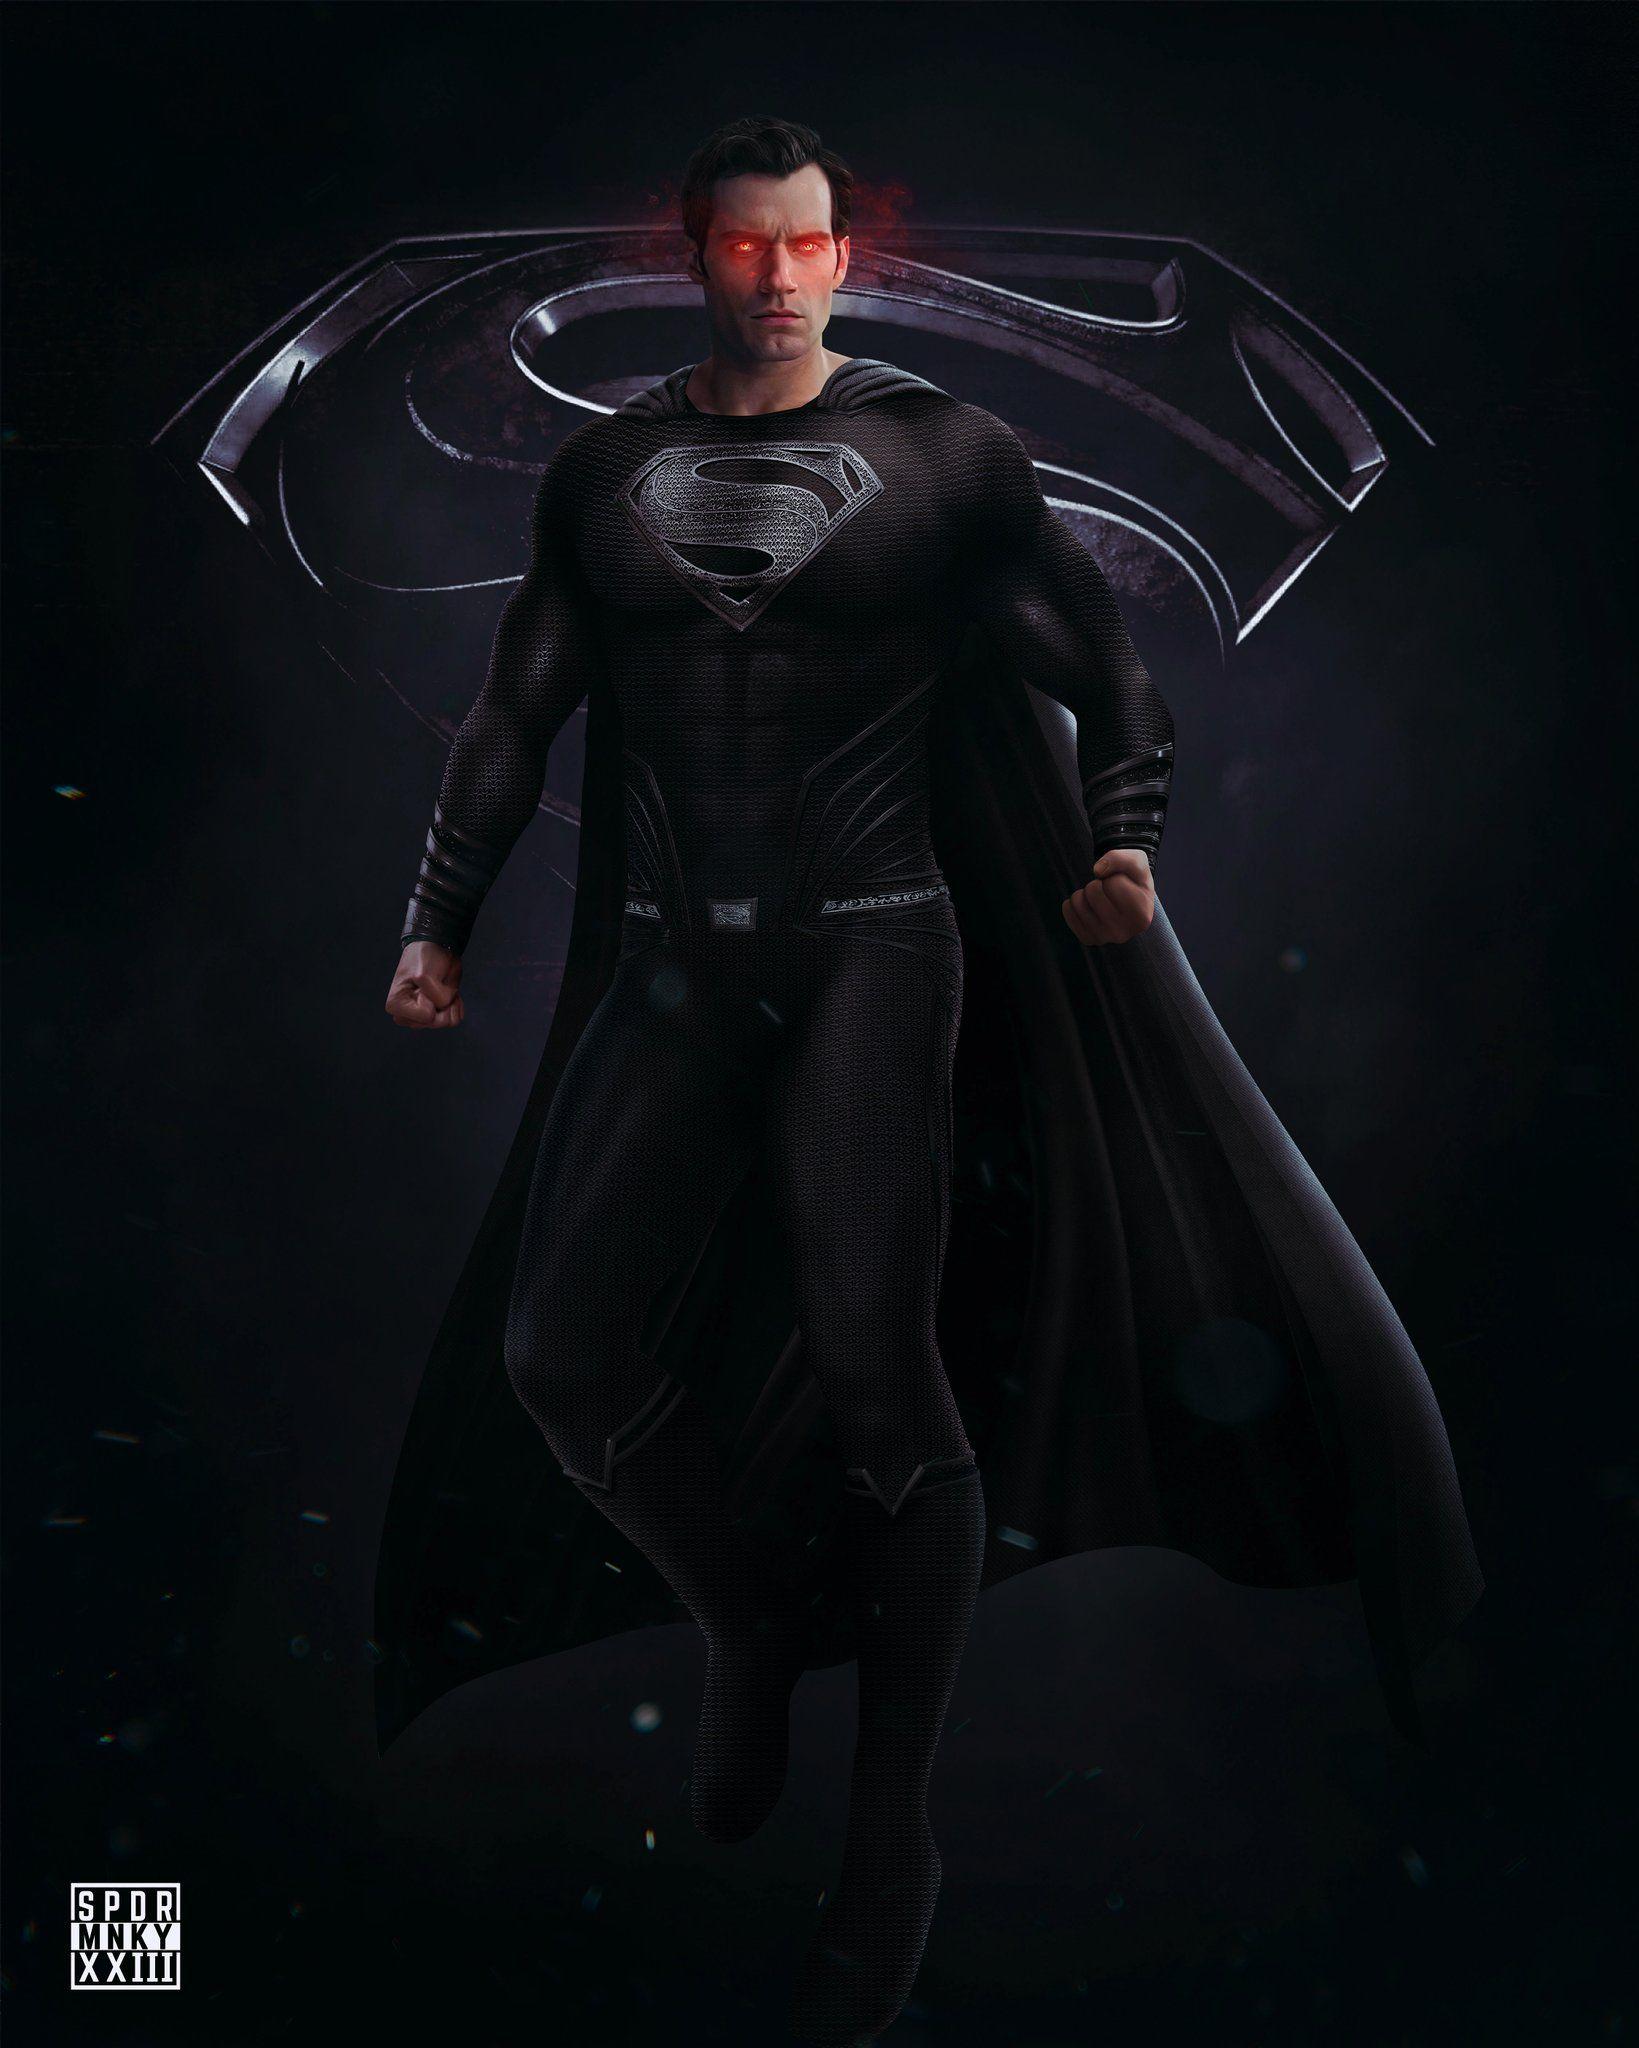 Spdrmnkyxxiii On Twitter In 2021 Batman Superman Wonder Woman Superman Artwork Superman Black Suit